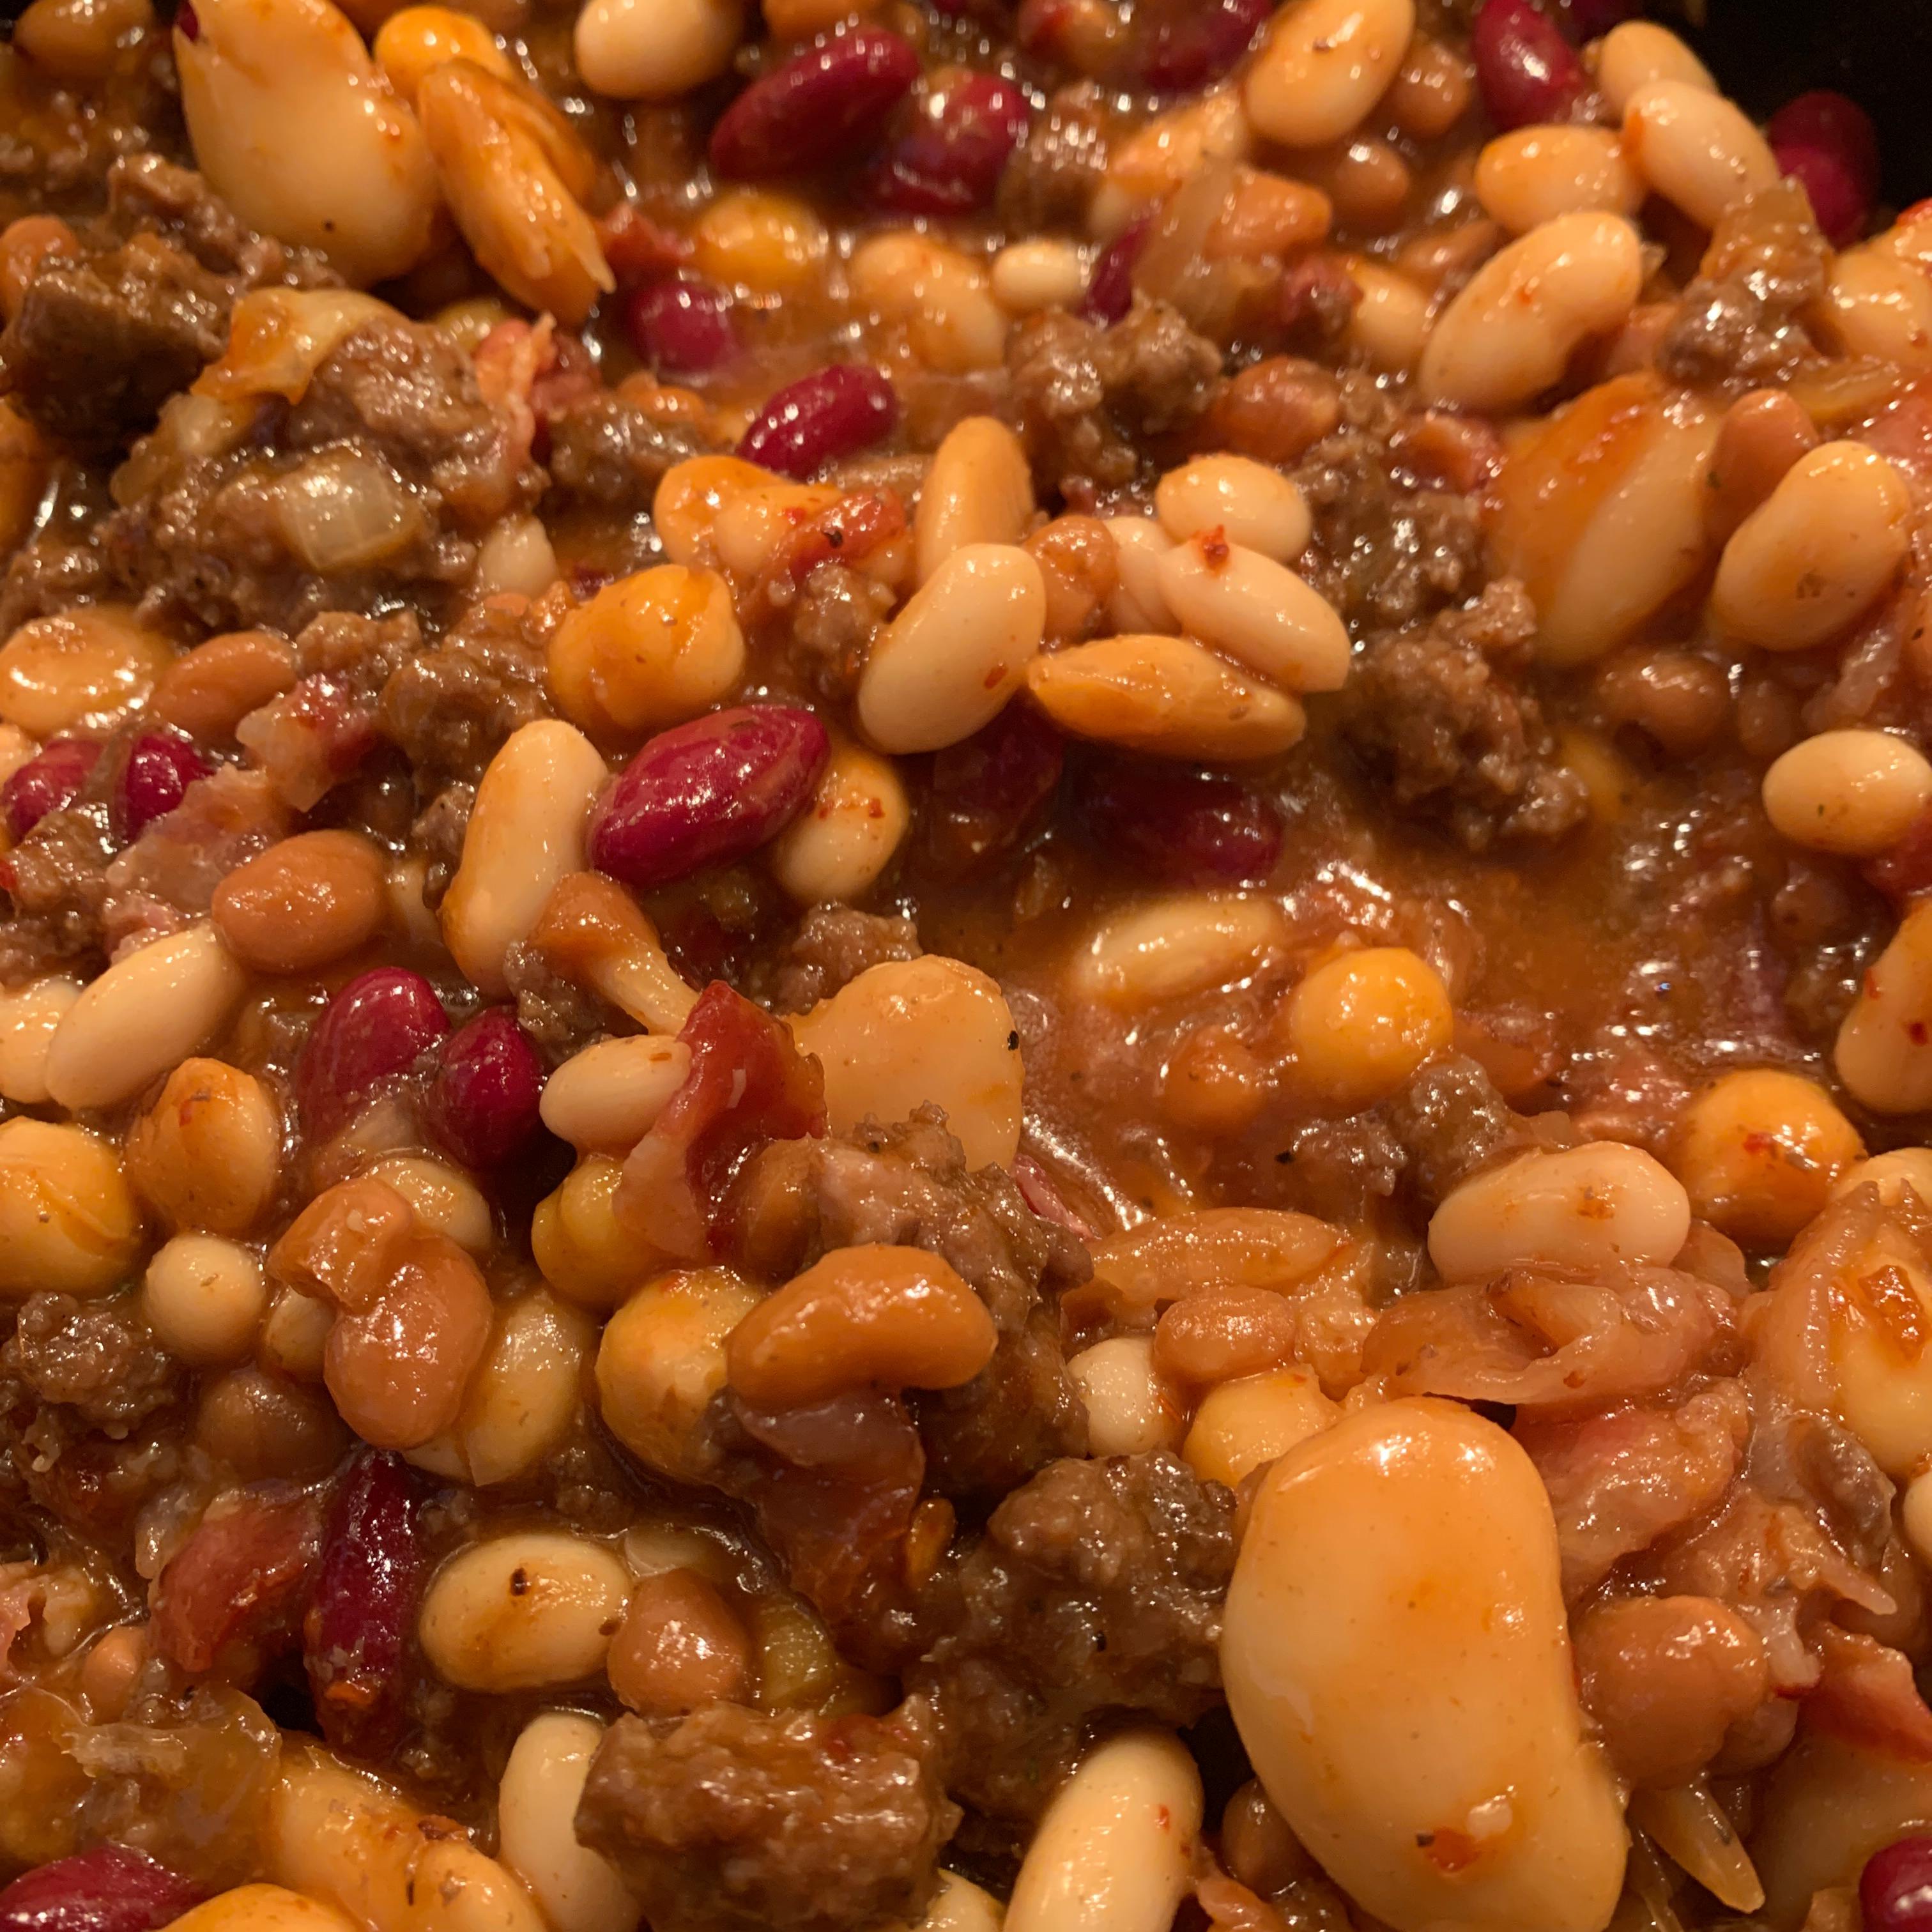 Baked Meaty Beans Nikki Dudley